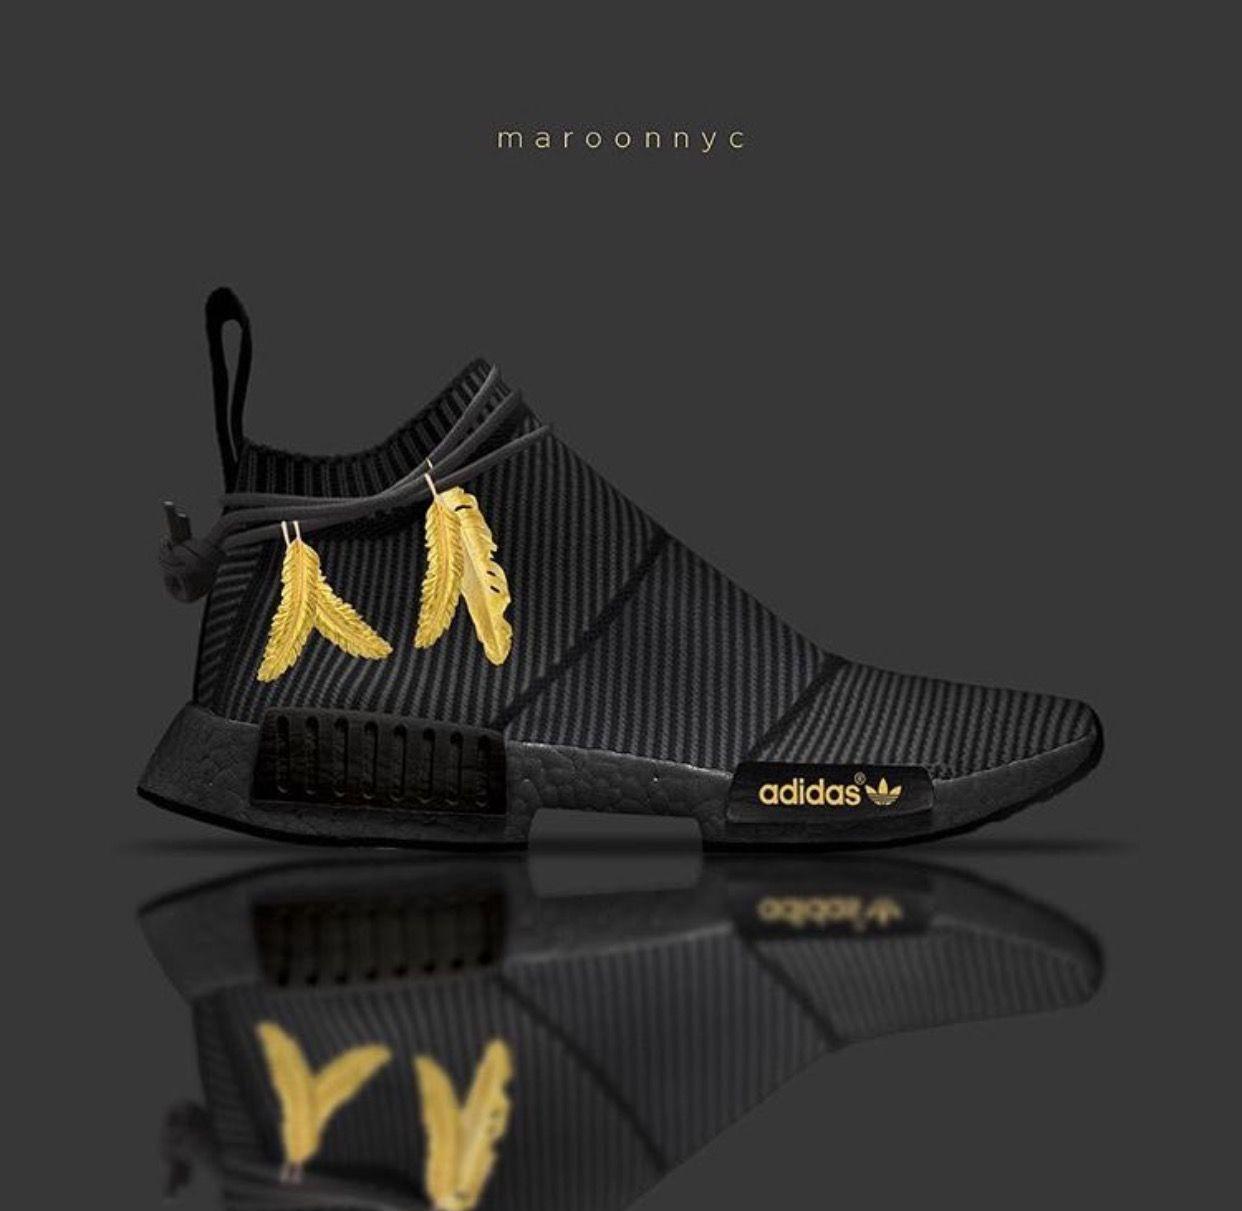 scarpe adidas sulla moda adidas, google e adidas donne